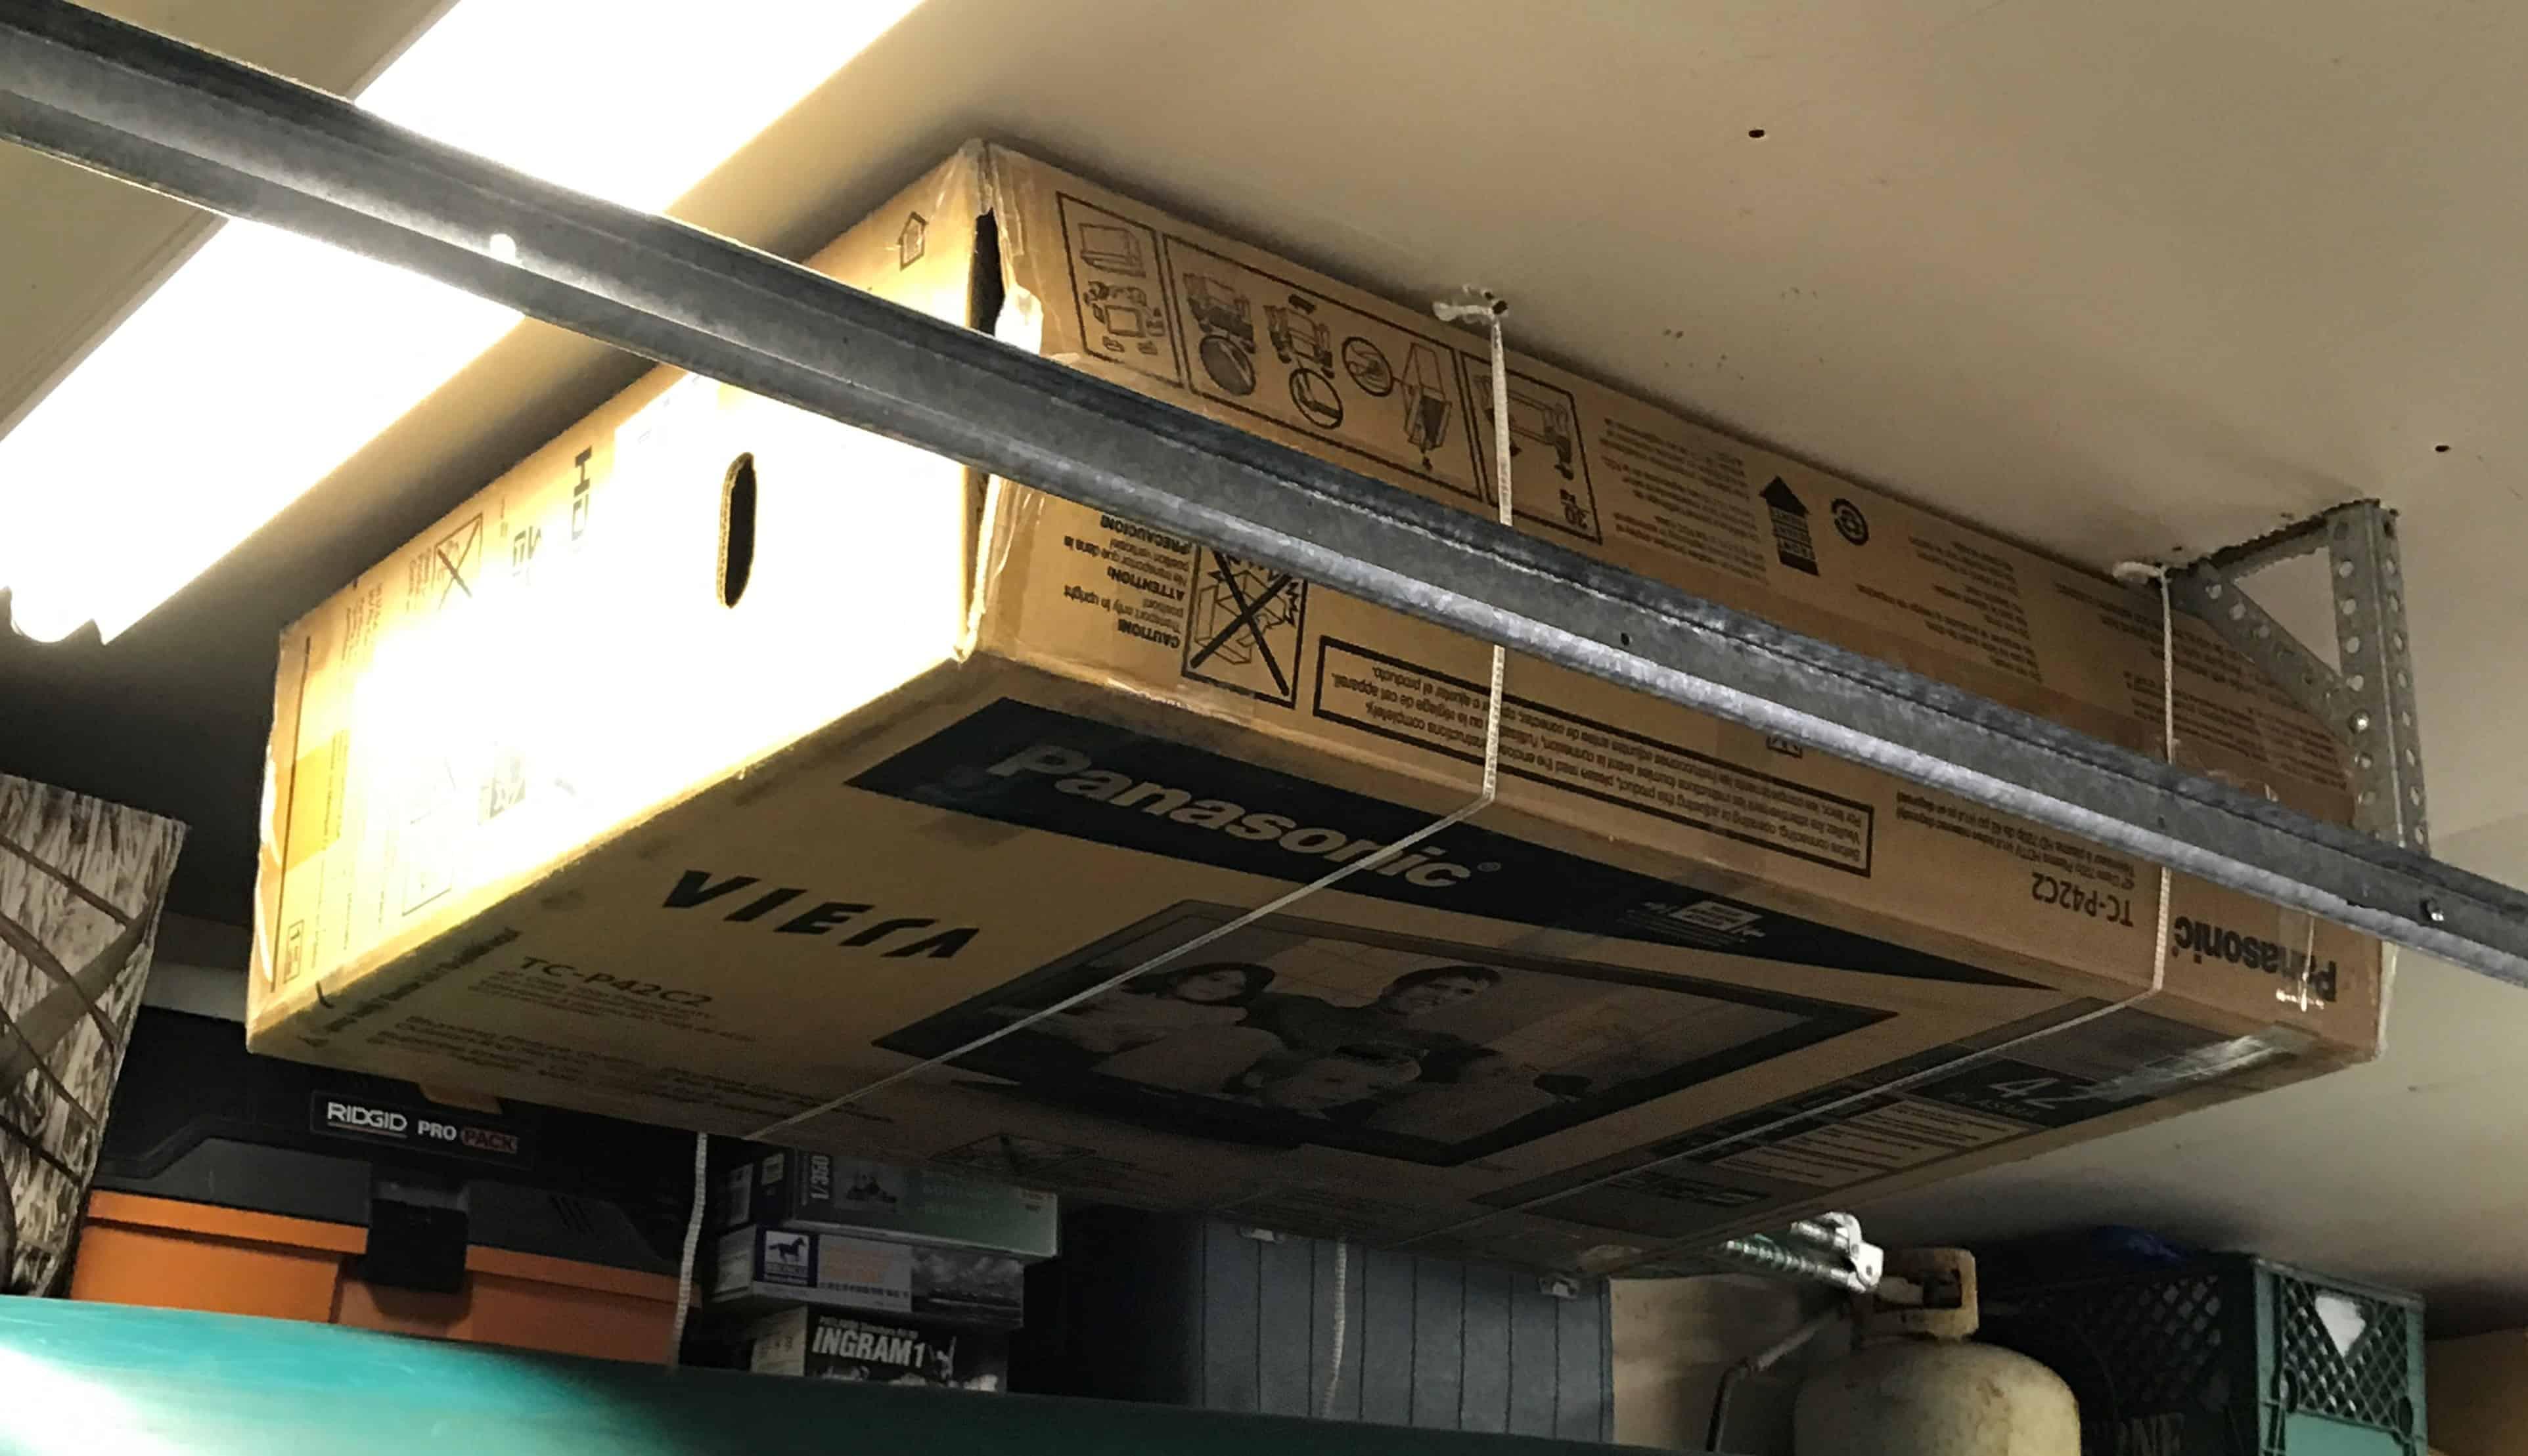 Maximize Storage Space how to maximize garage storage space - the organized mom